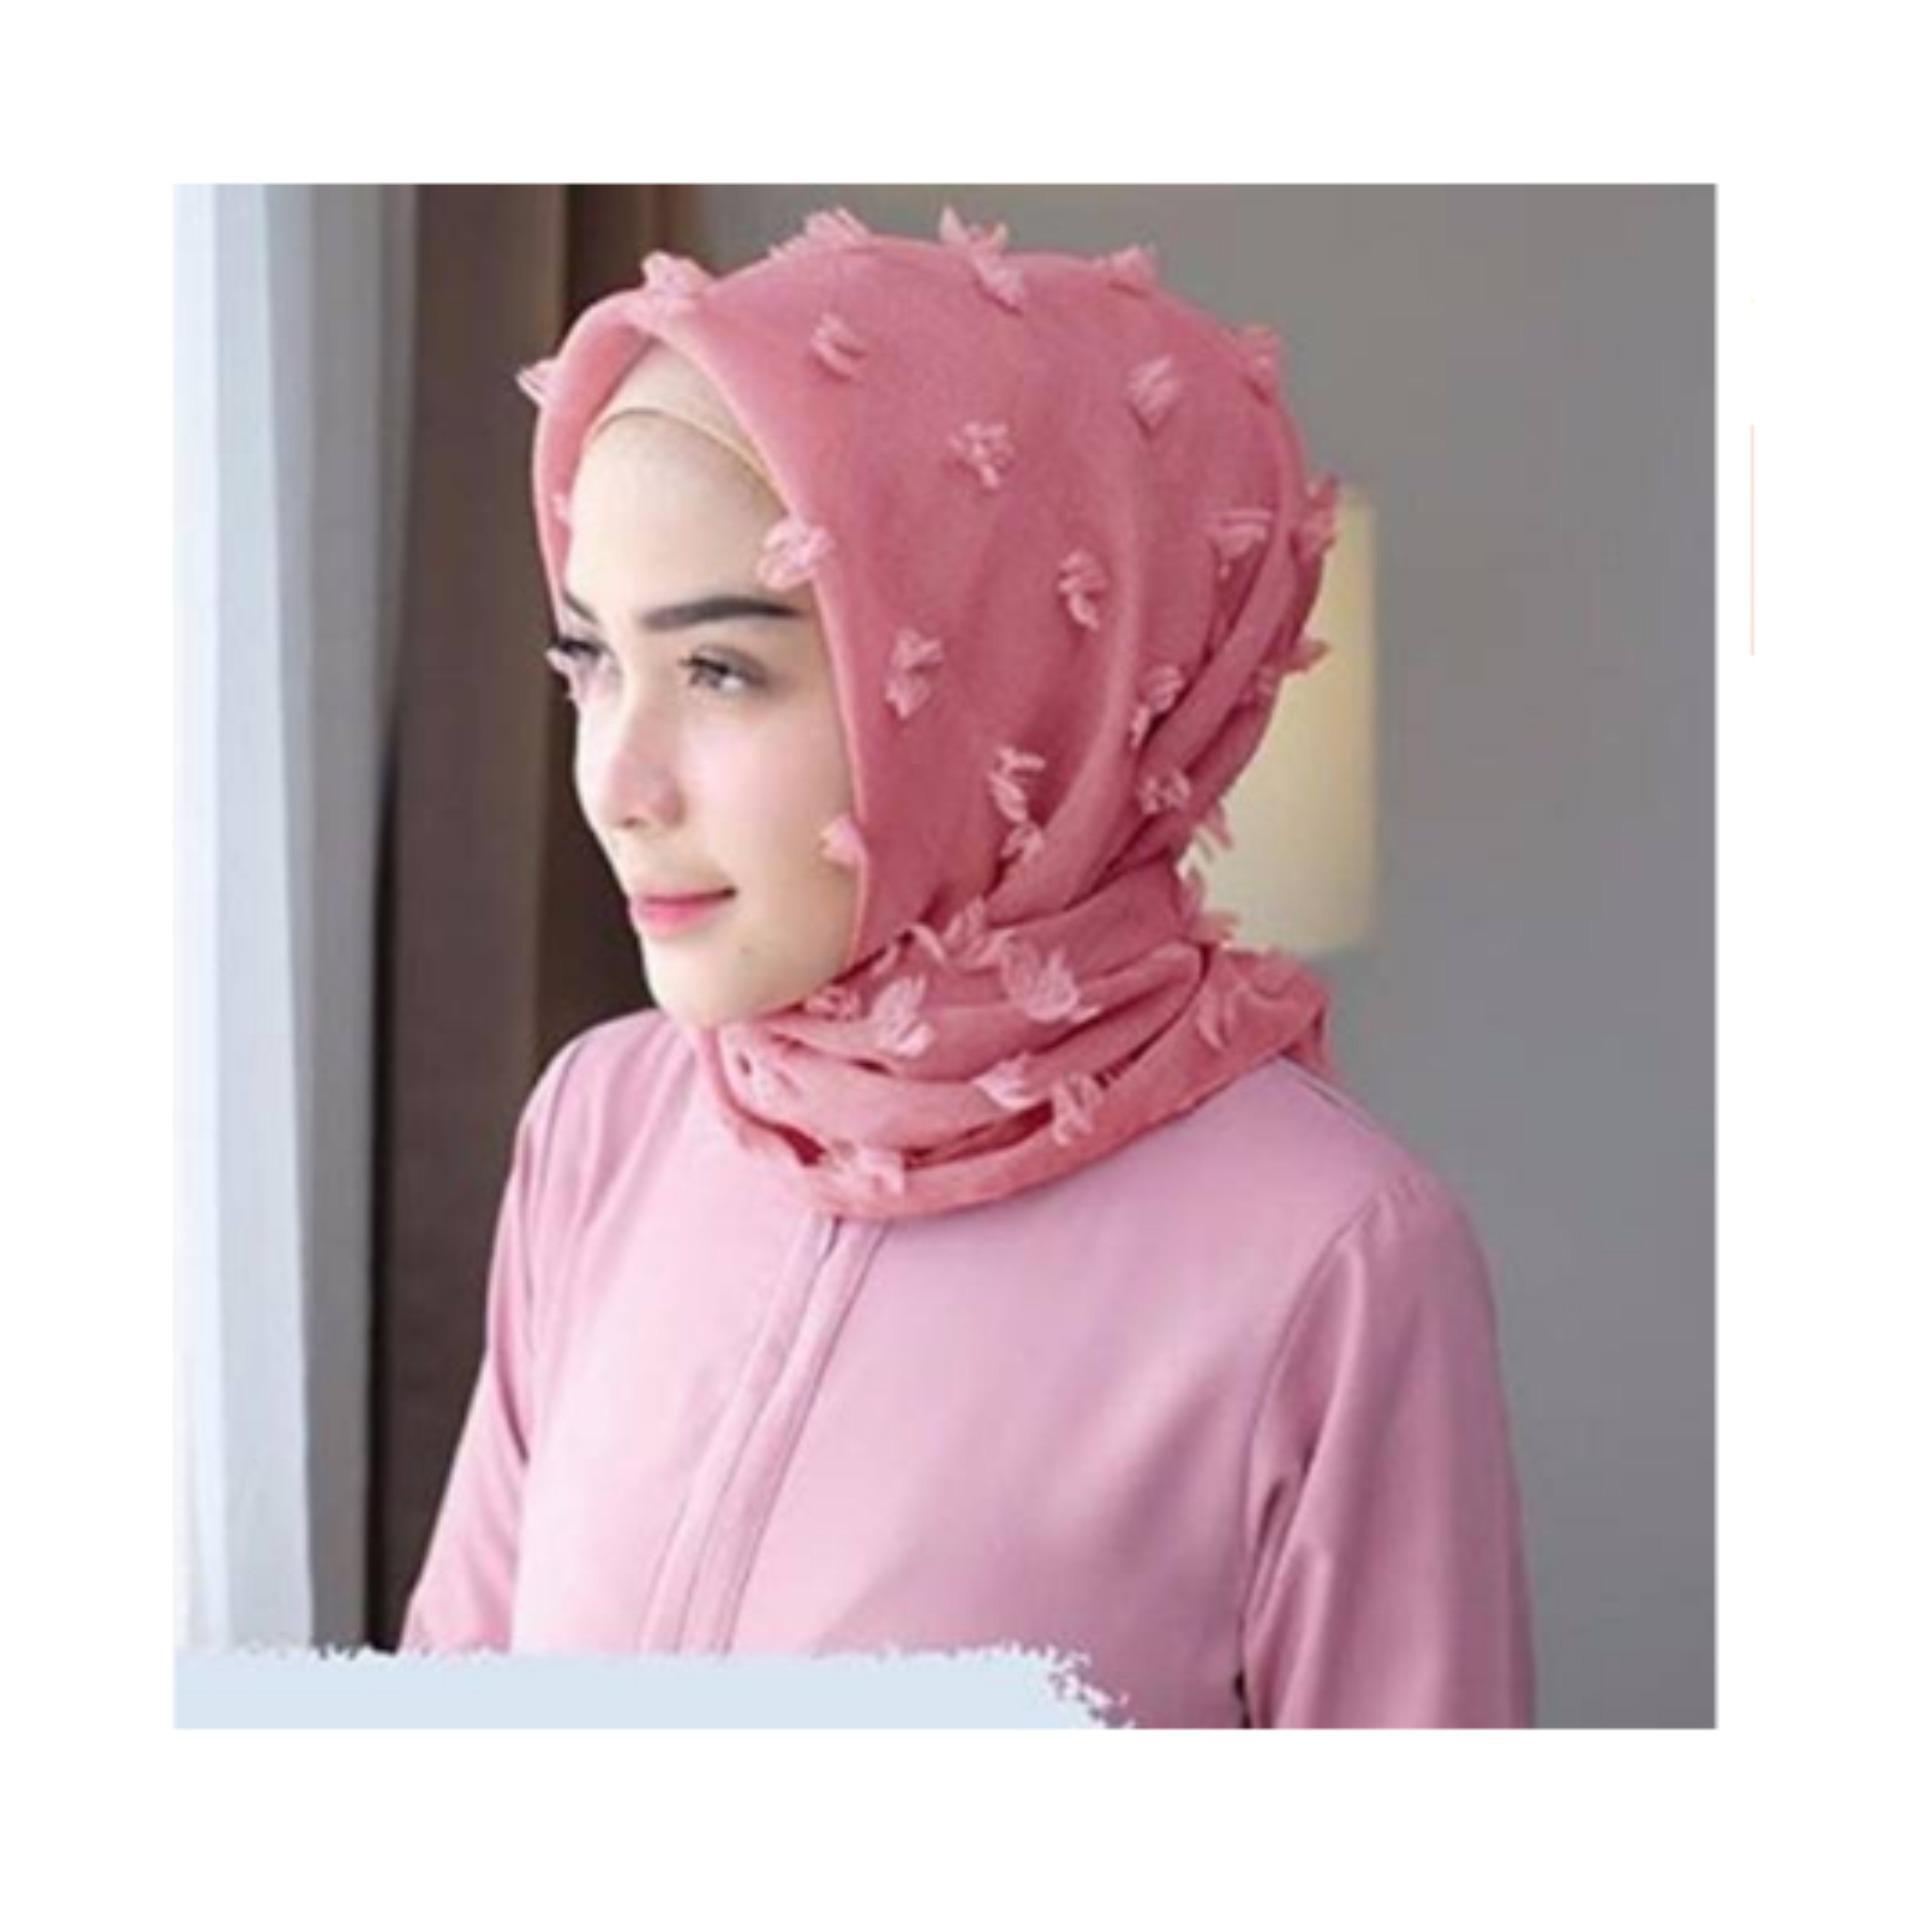 Import Umma Carf JABAR - FREE ONGKIR Kerudung Hijab Jilbab Umma Pink Merah  Muda Linen Wanita Segi empat Linen 284df01dc2